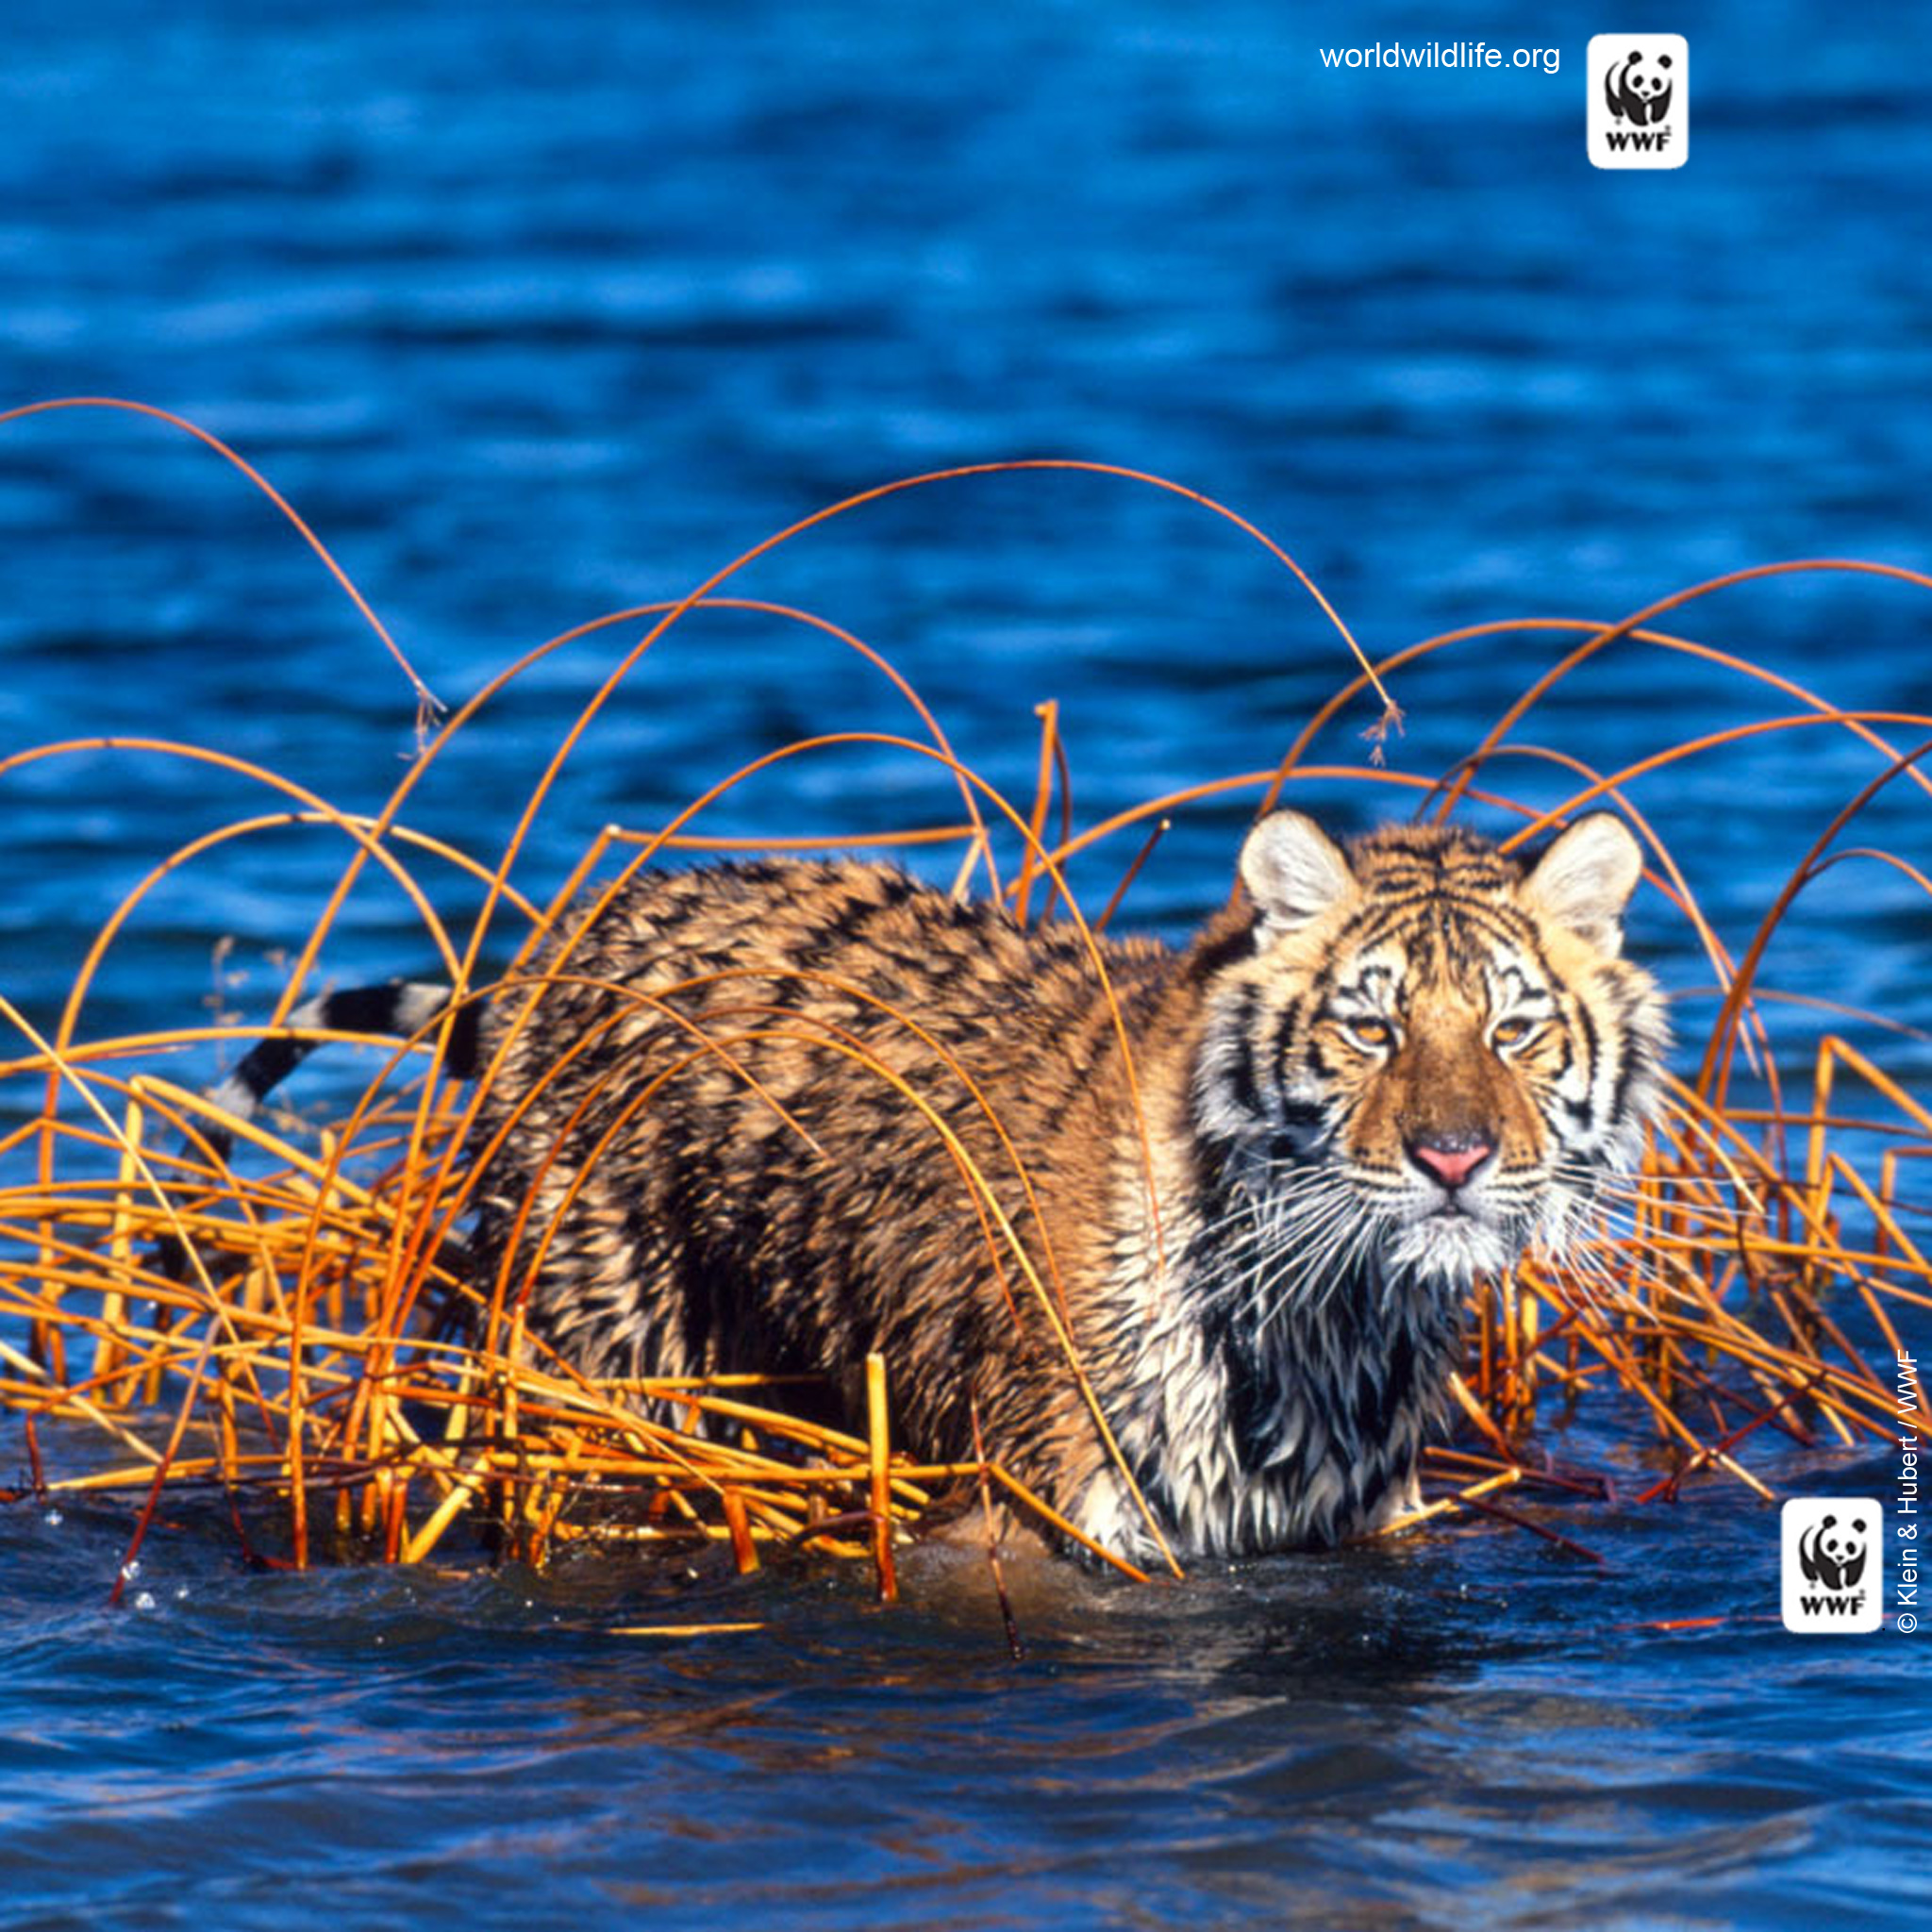 Tiger Mobile Wallpaper Wwf World Wildlife Fund